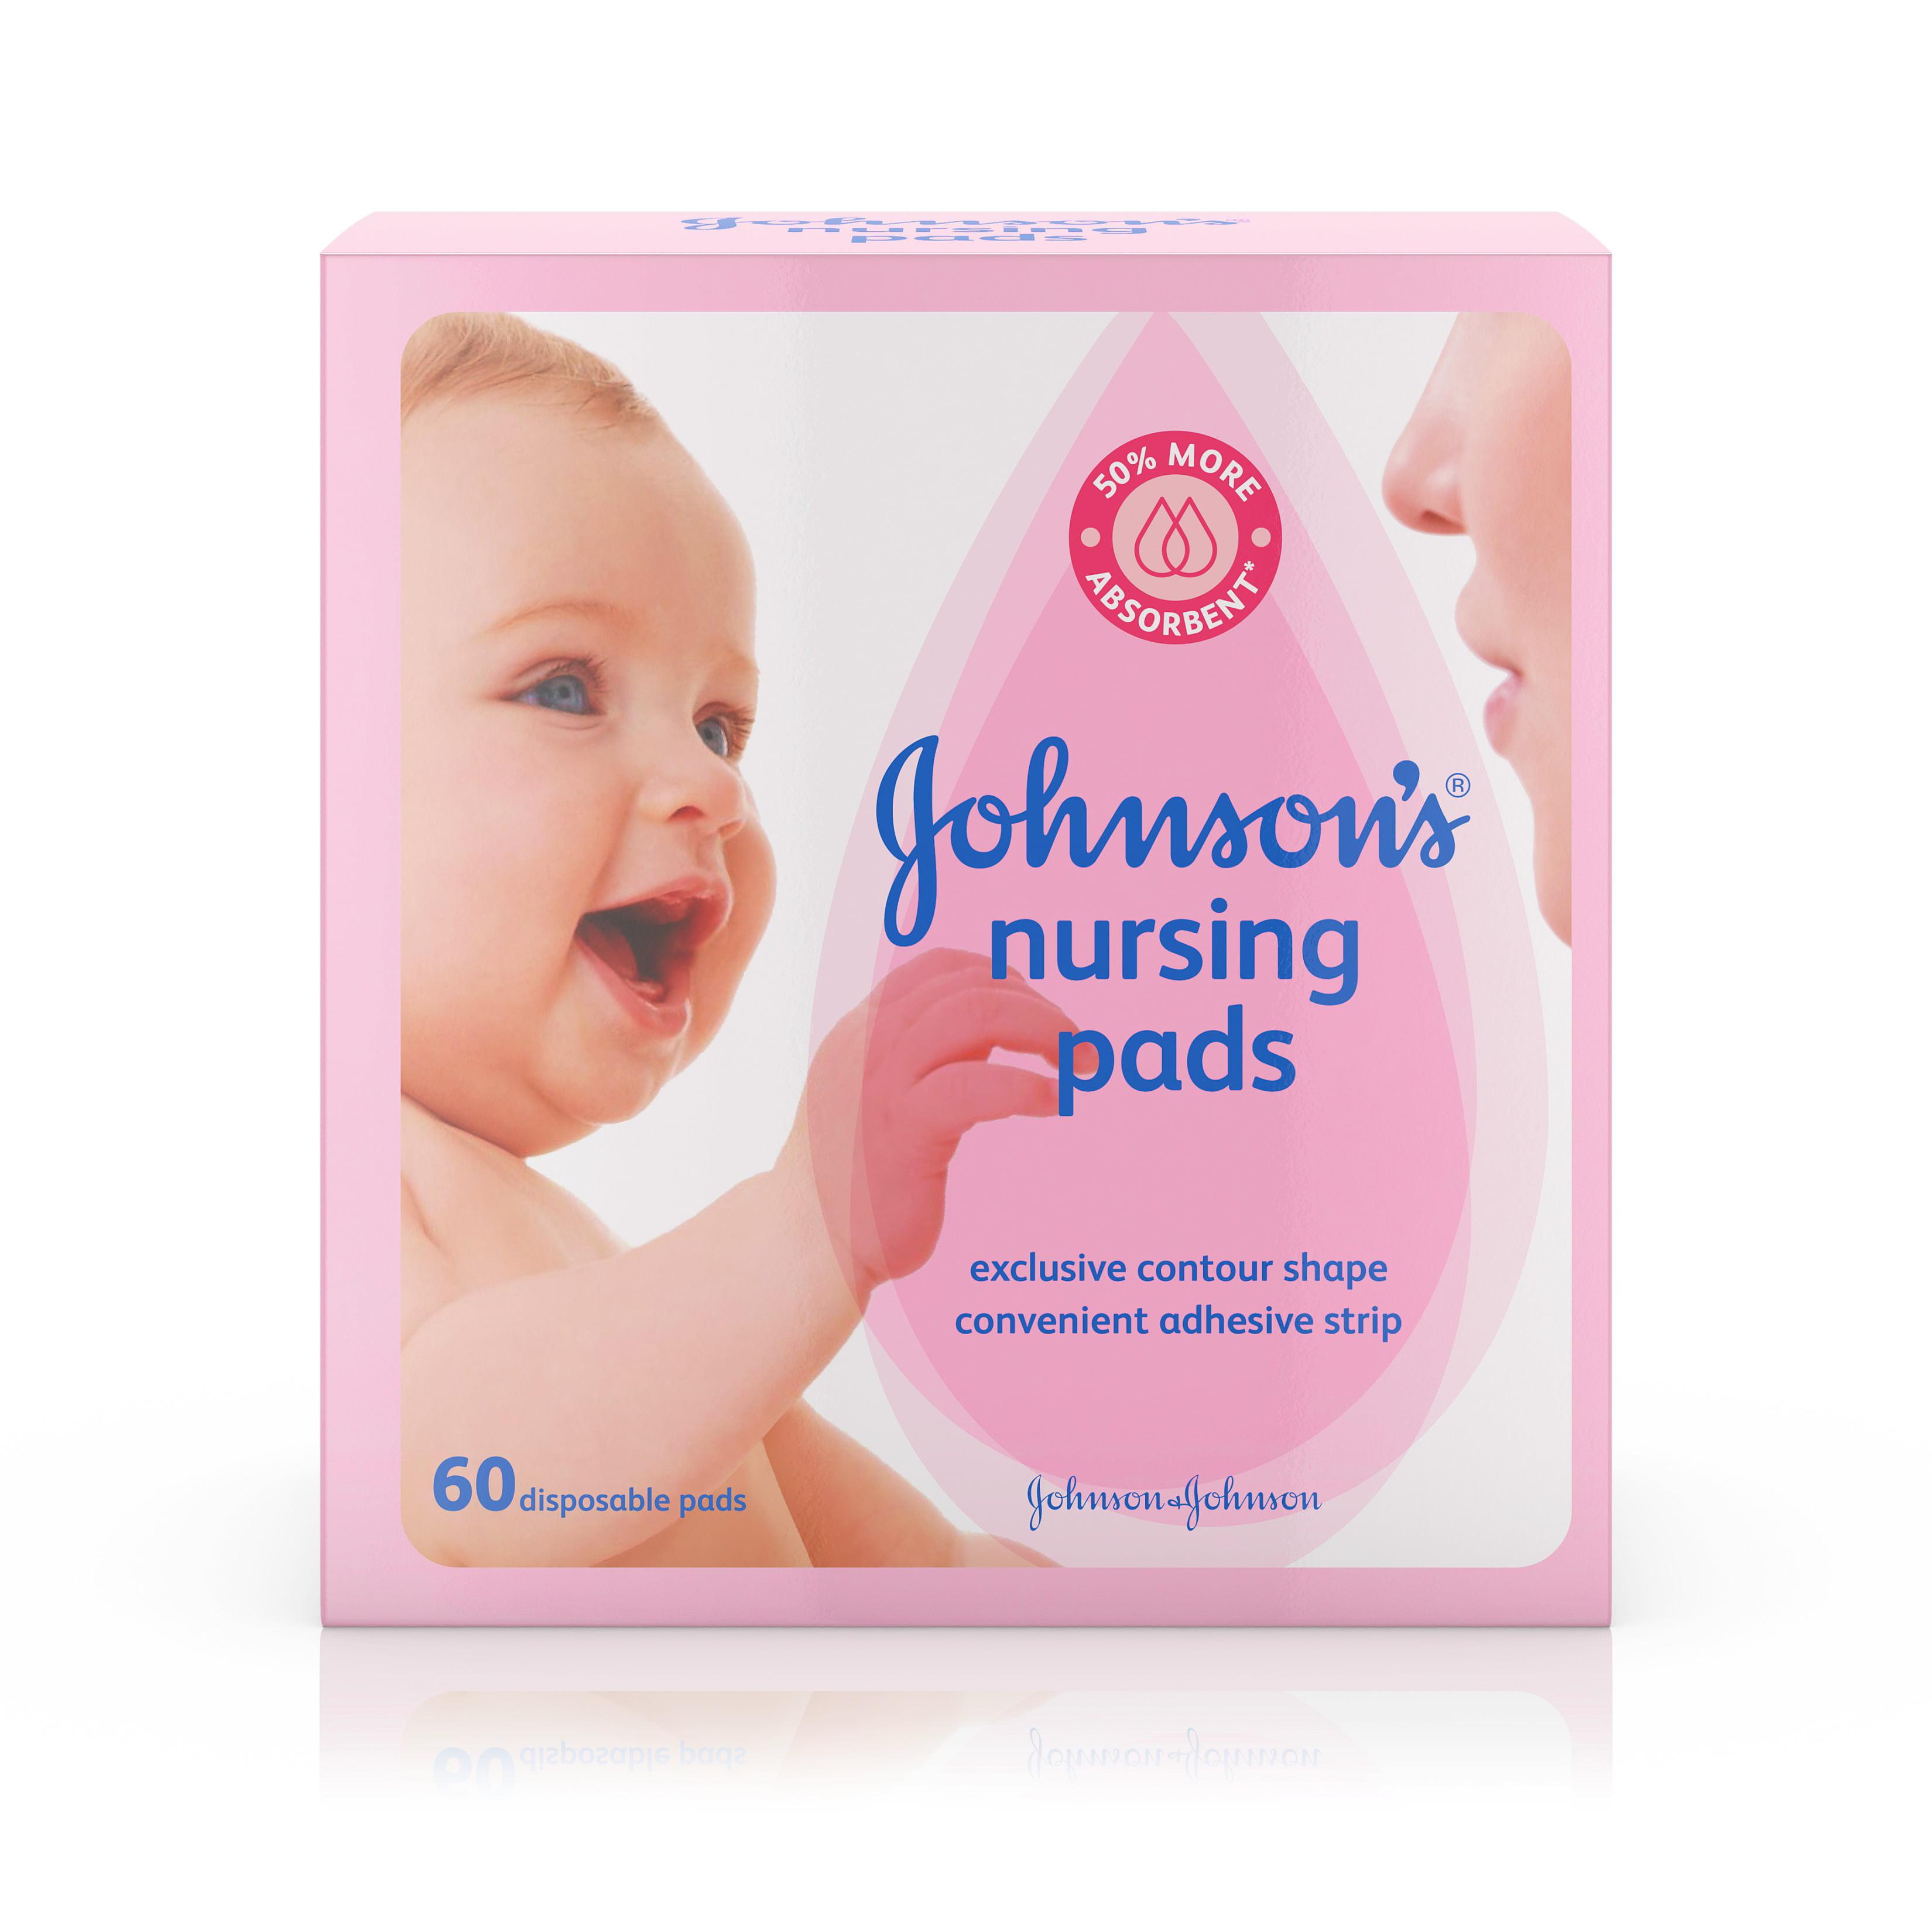 Johnson's Nursing Pads 60 Count by Johnson %26 Johnson